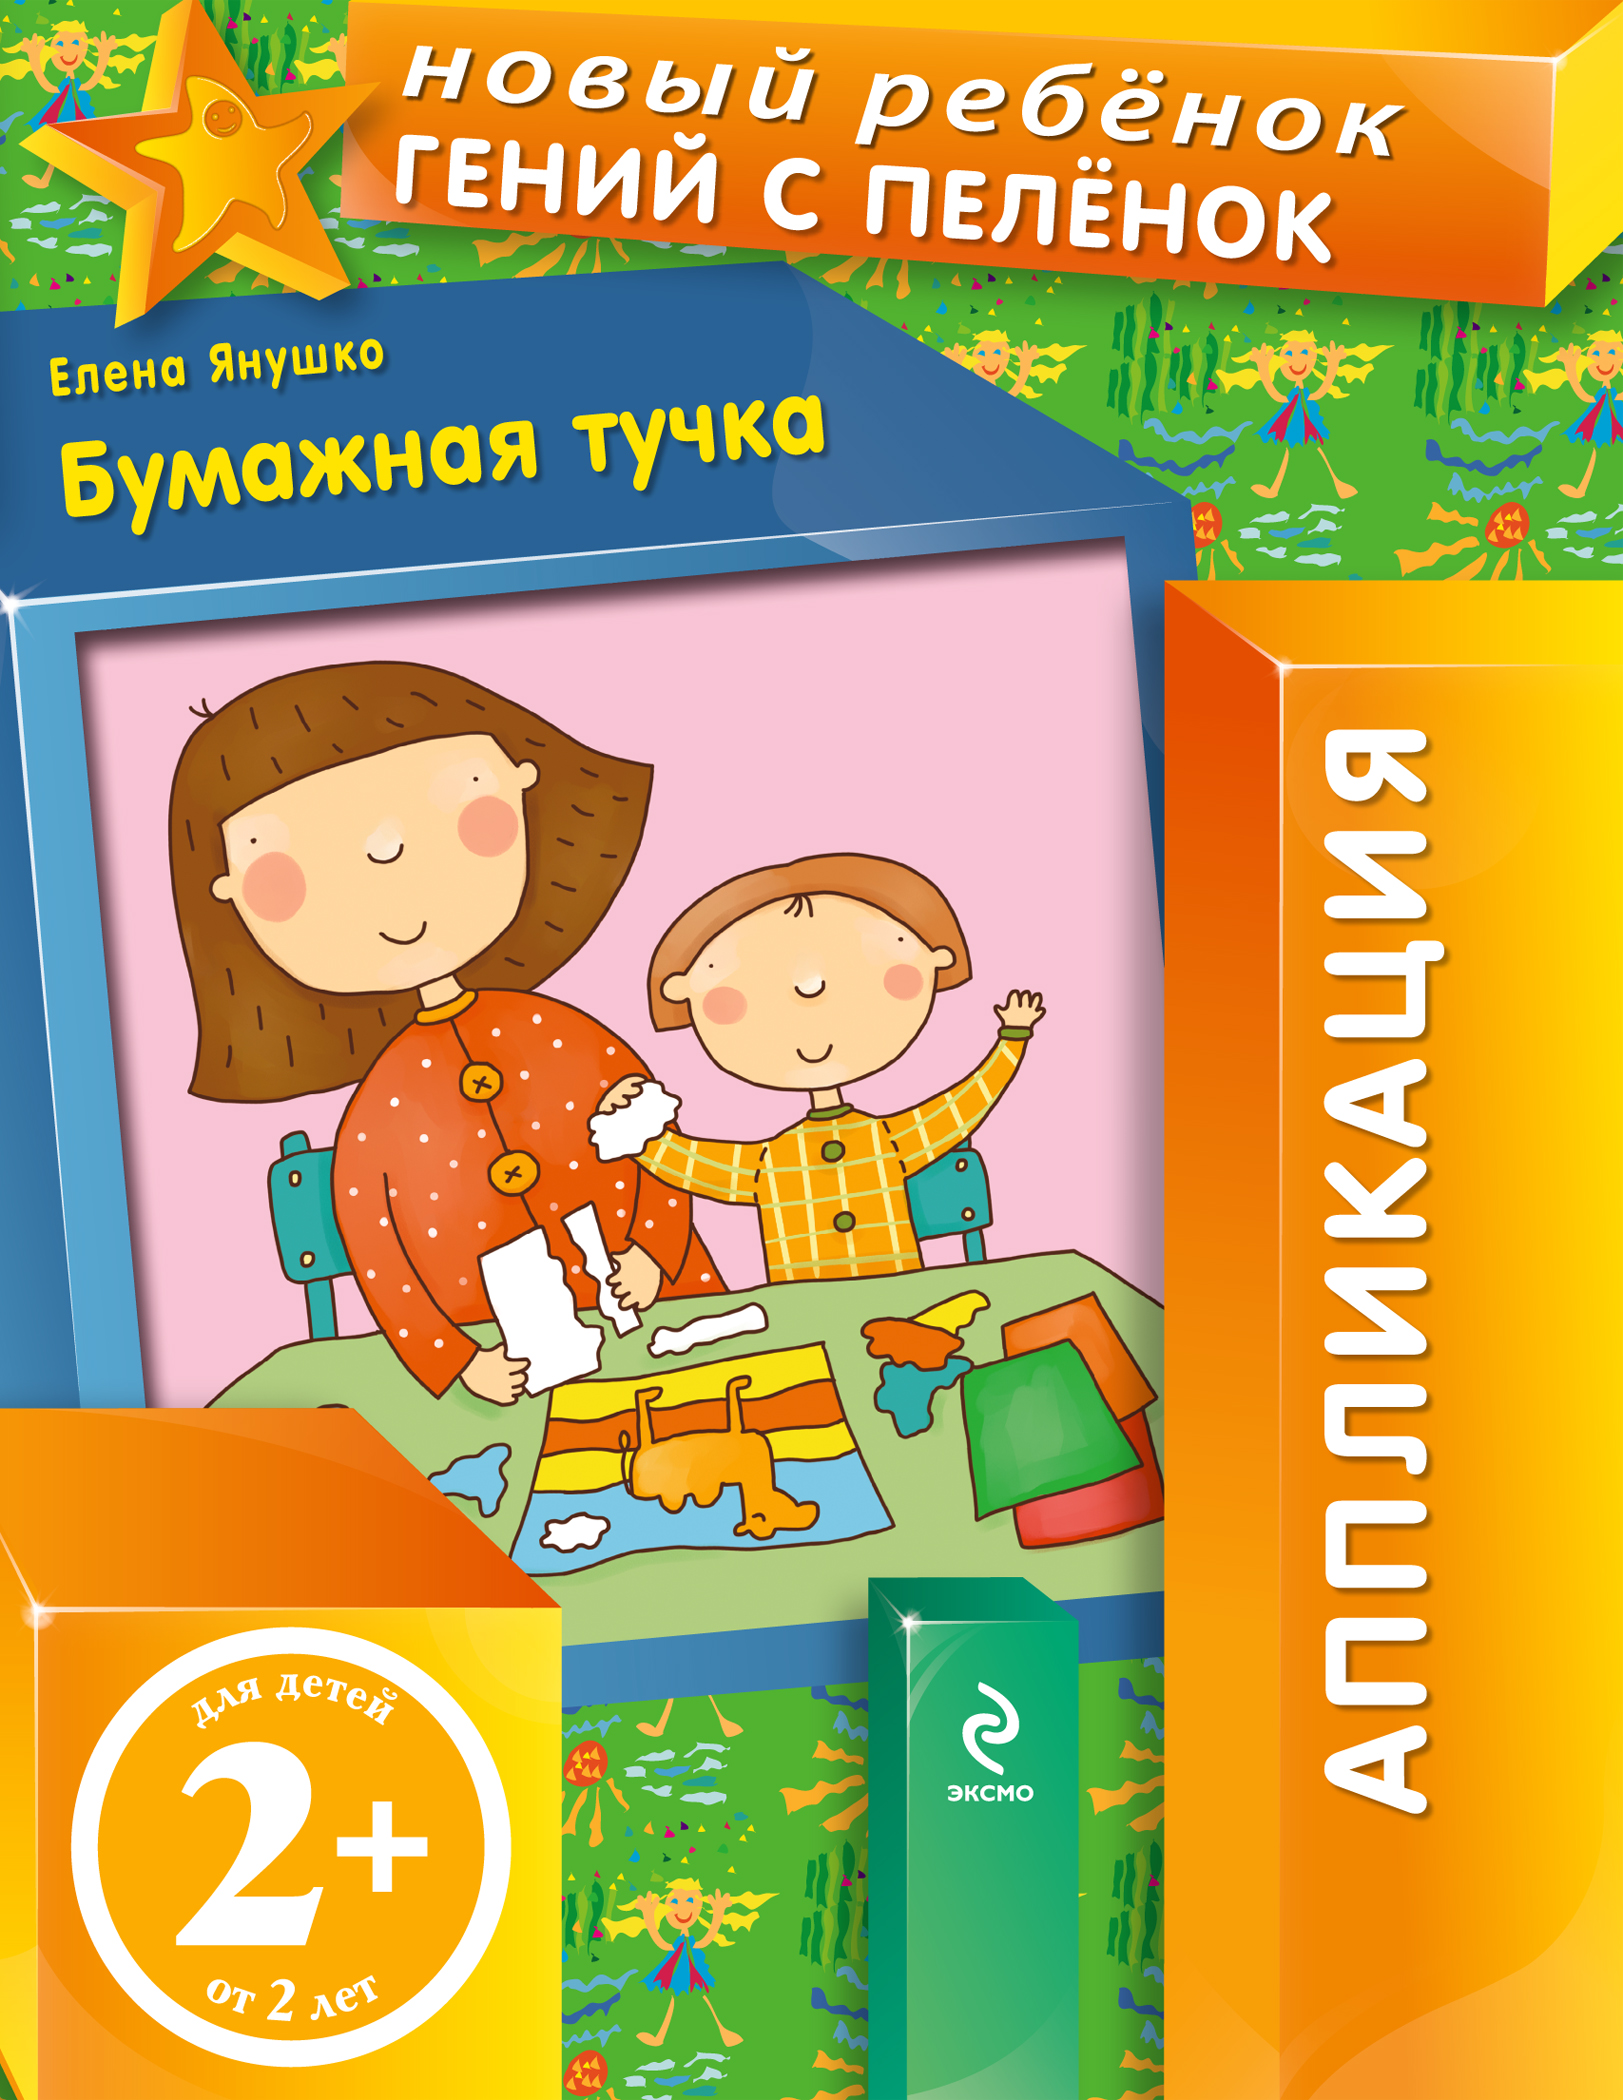 2+ Бумажная тучка ( Янушко Е.А.  )